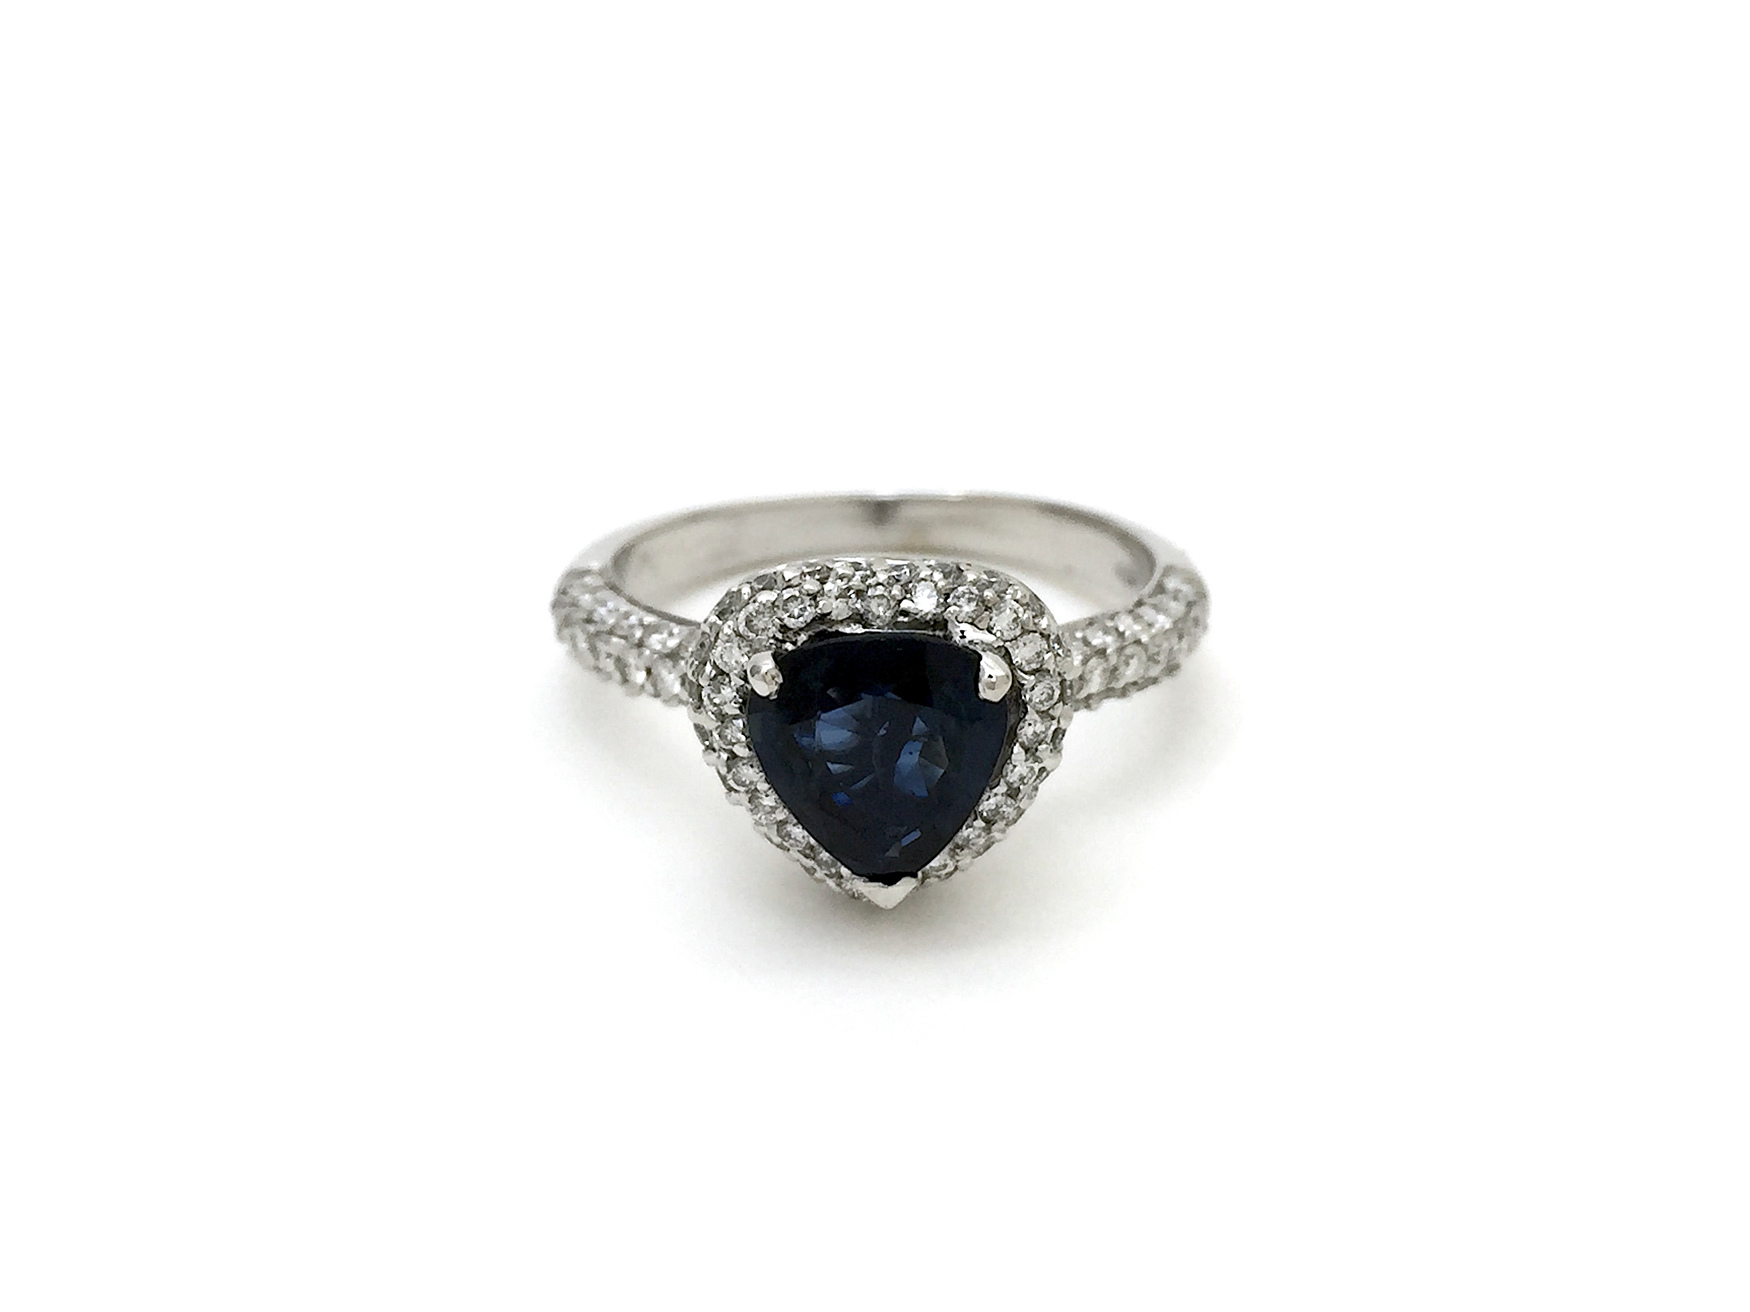 Sensi joyas alta joyería Granada plata compromiso ANILLO ORO BLANCO  18K BRILLANTES  0,90 CTS